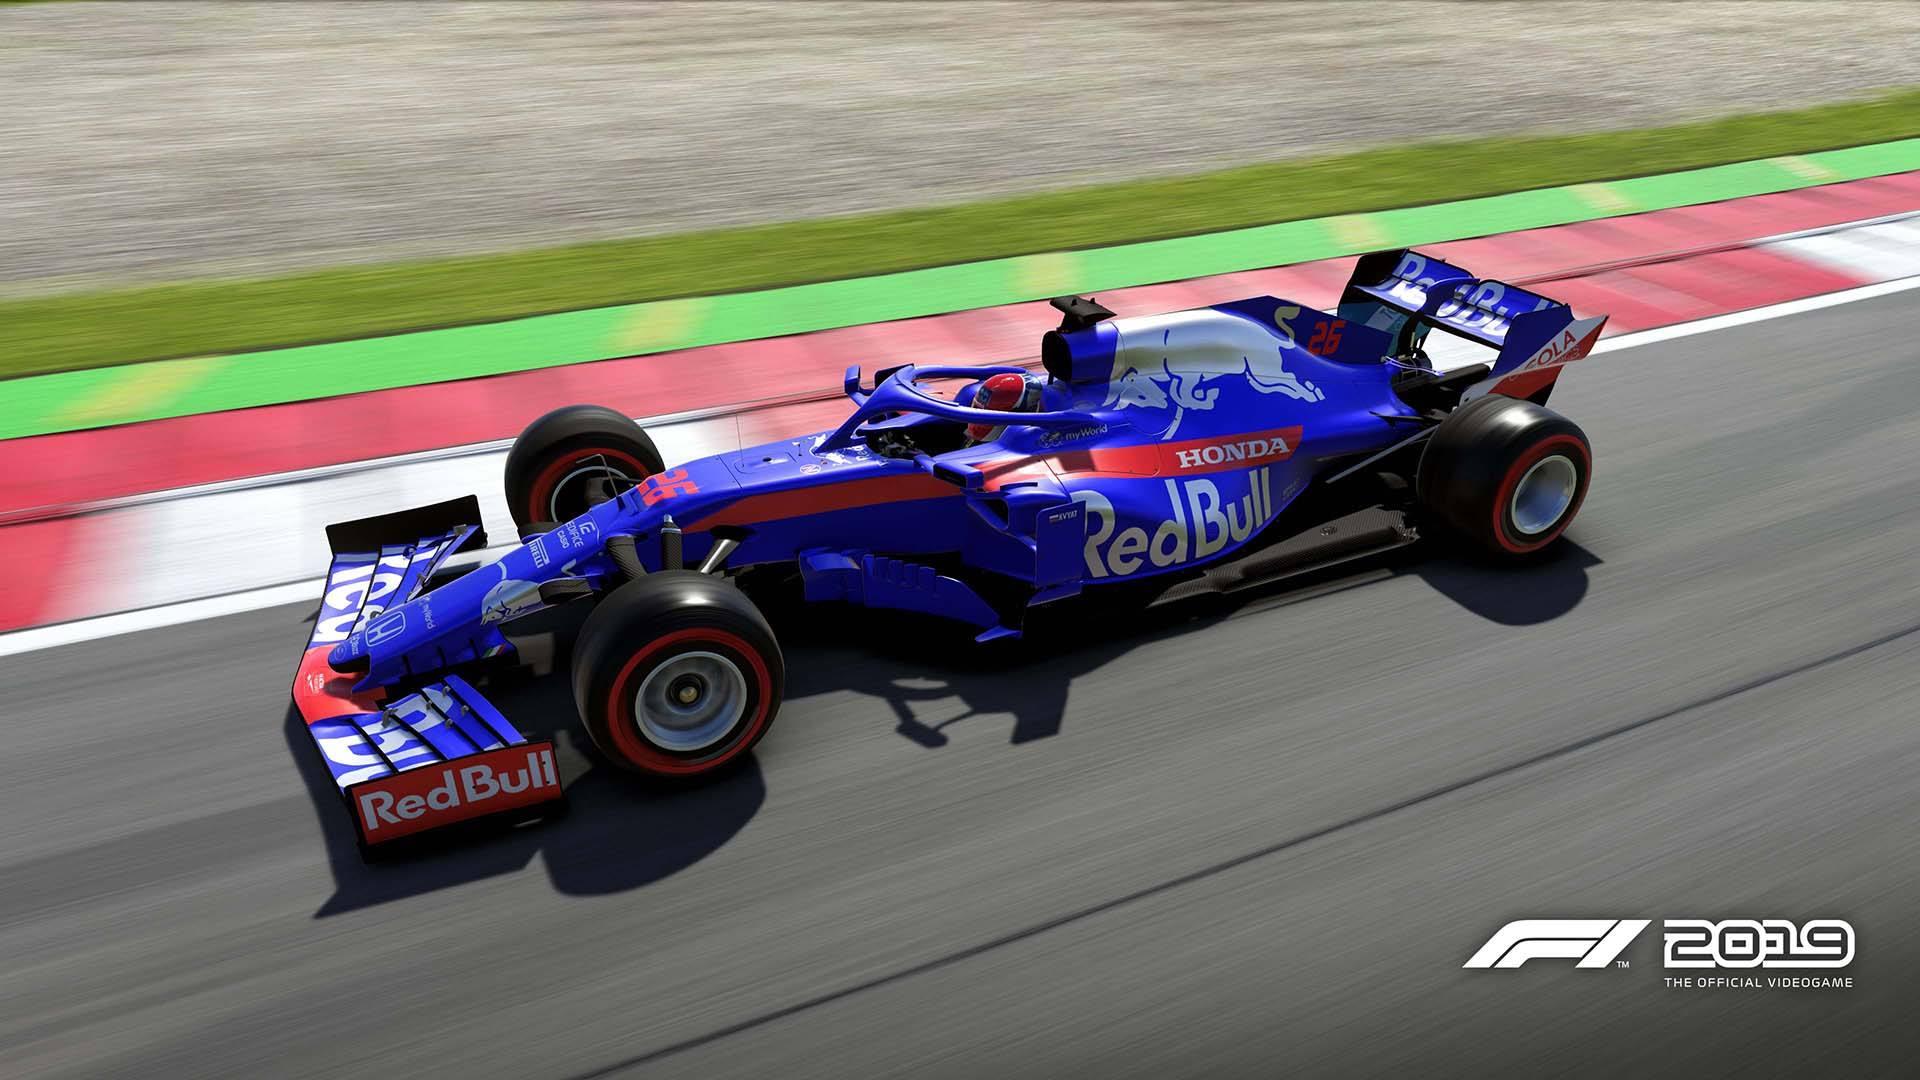 F1 2019 Updated.jpg